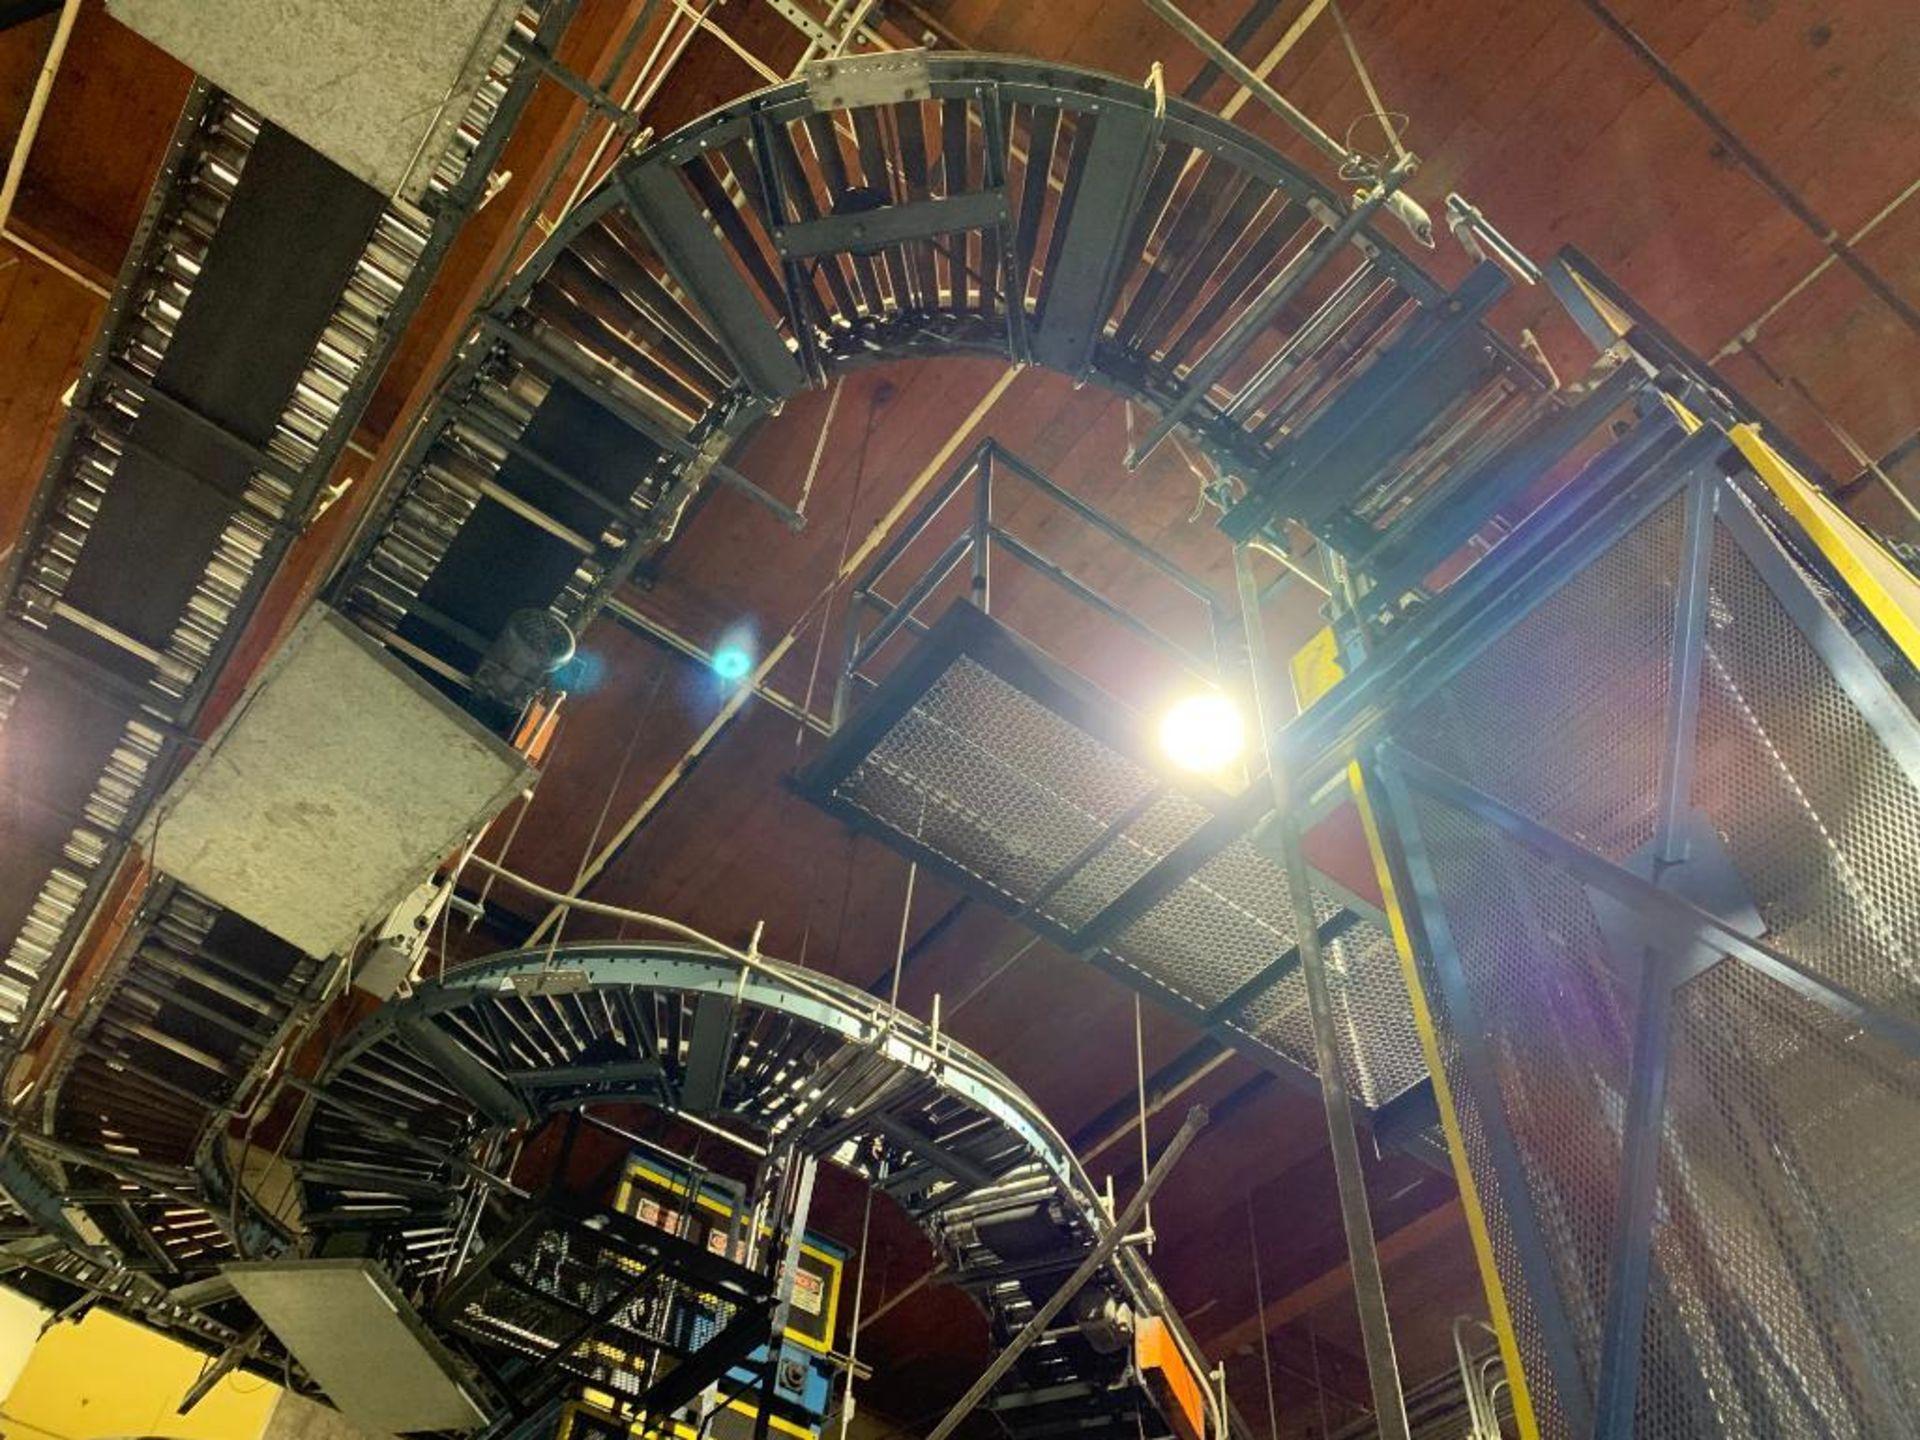 overhead power case conveyor - Image 3 of 3